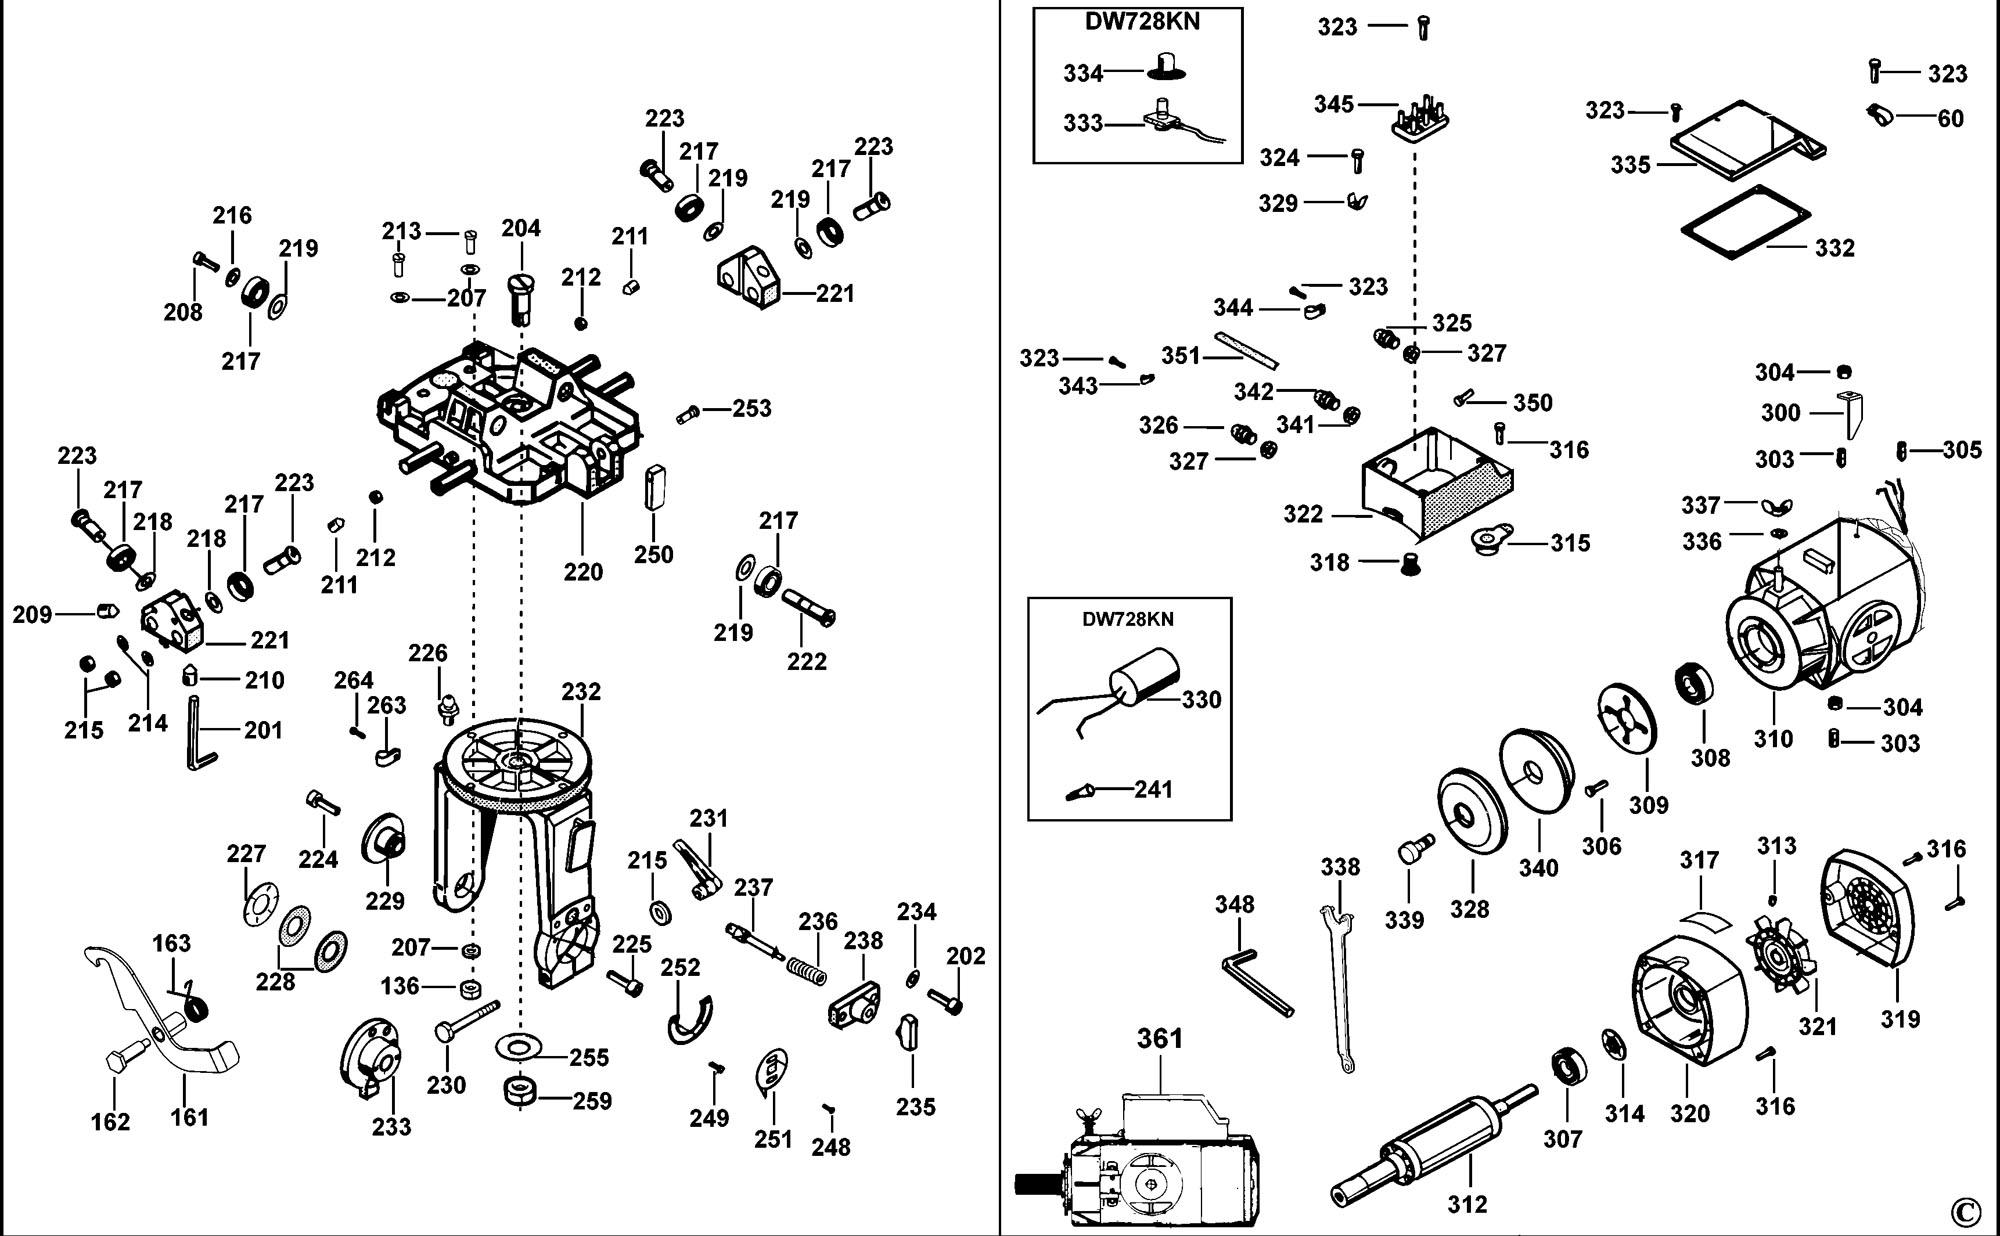 Spares for Dewalt Dw728kn Radial Arm Saw (type 1) SPARE